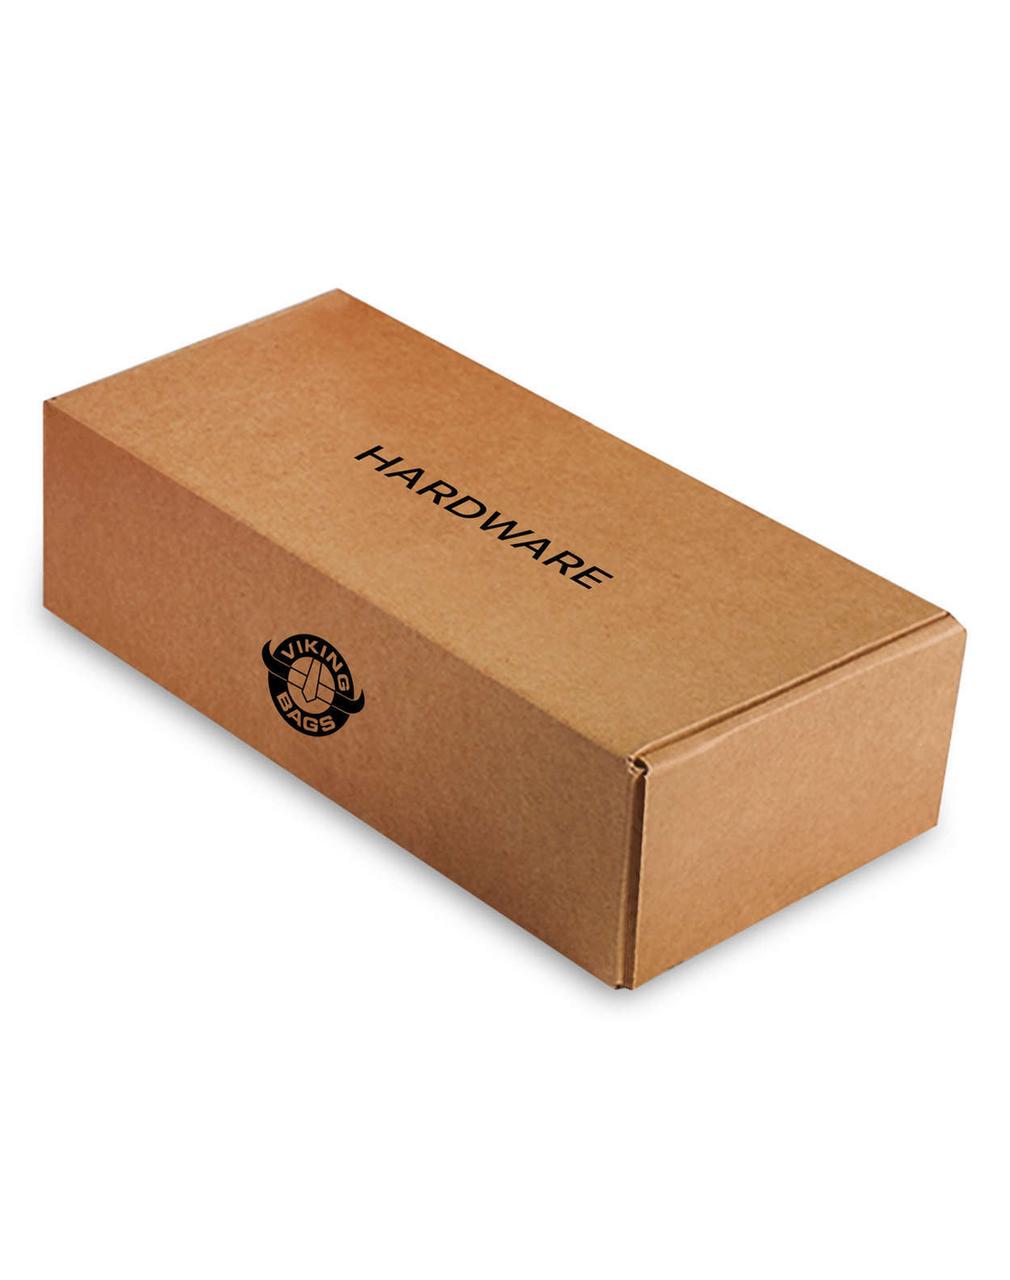 Kawasaki Eliminator 125 Thor Series Small Motorcycle Saddlebags Hardware Box